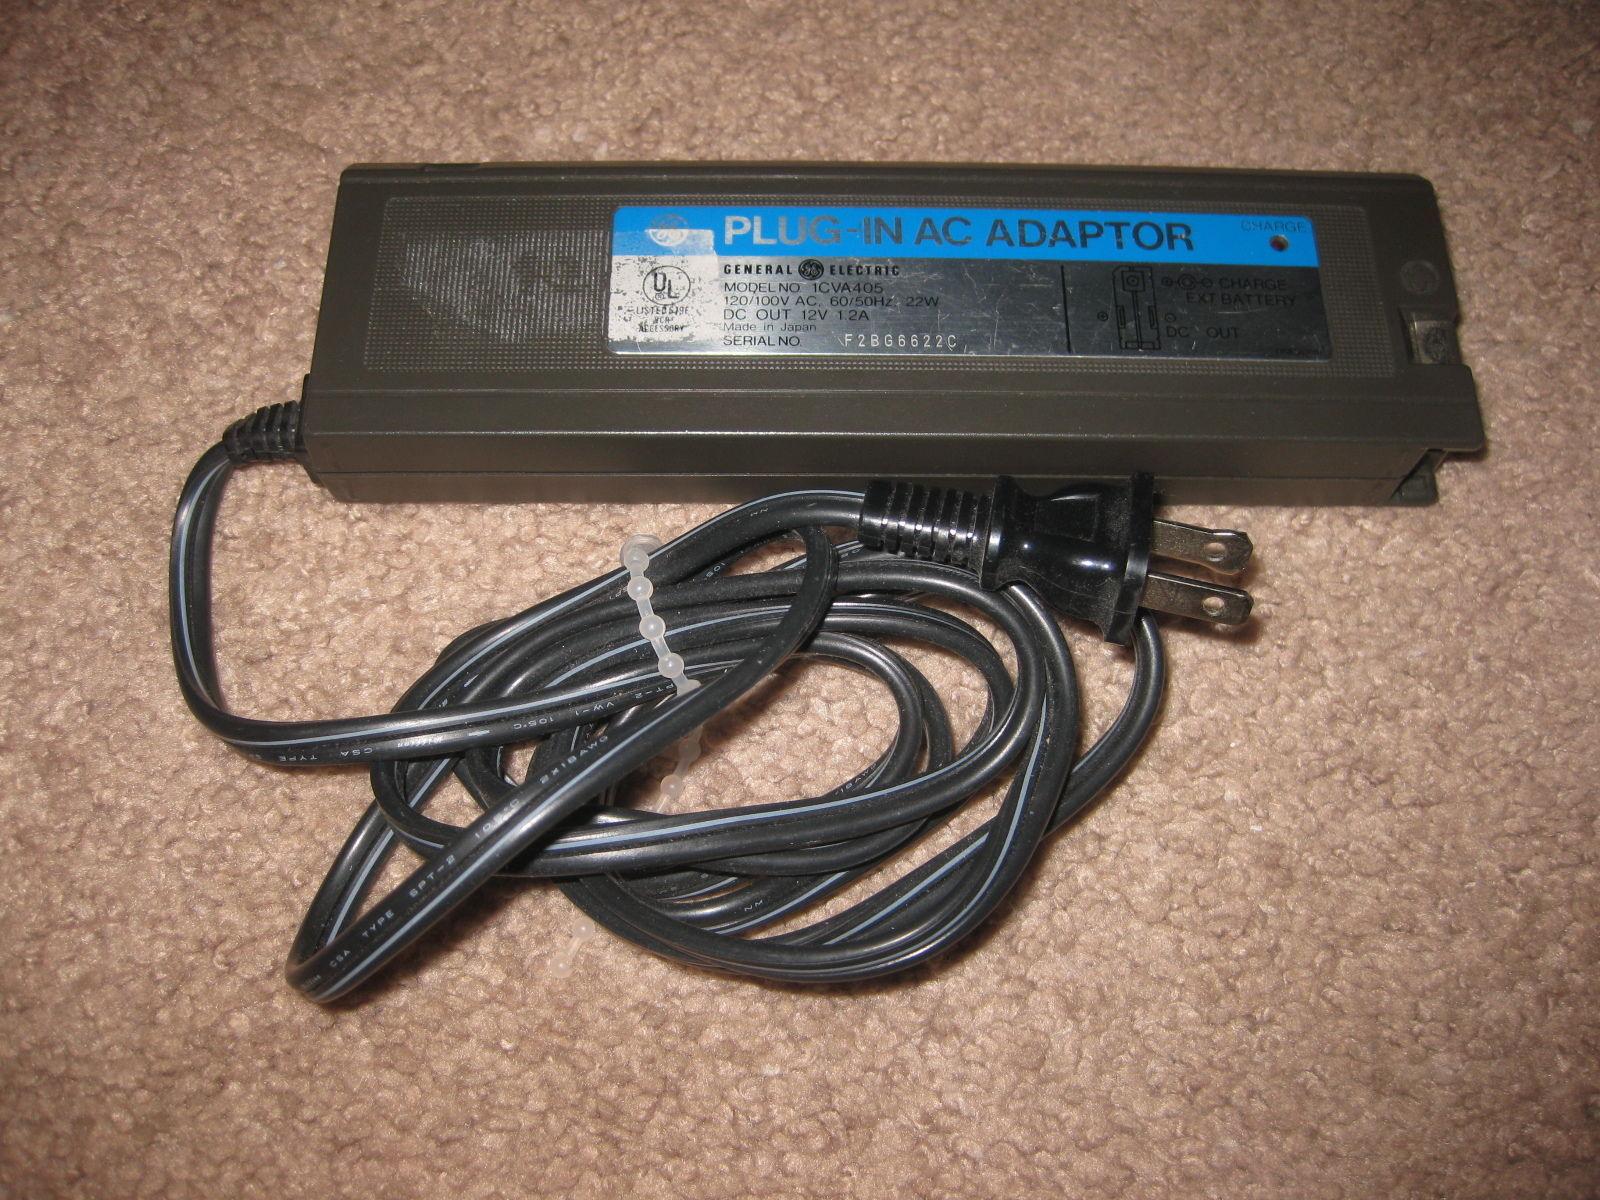 GENERAL ELECTRIC VHS PLUG IN AC ADAPTER 1CVA405